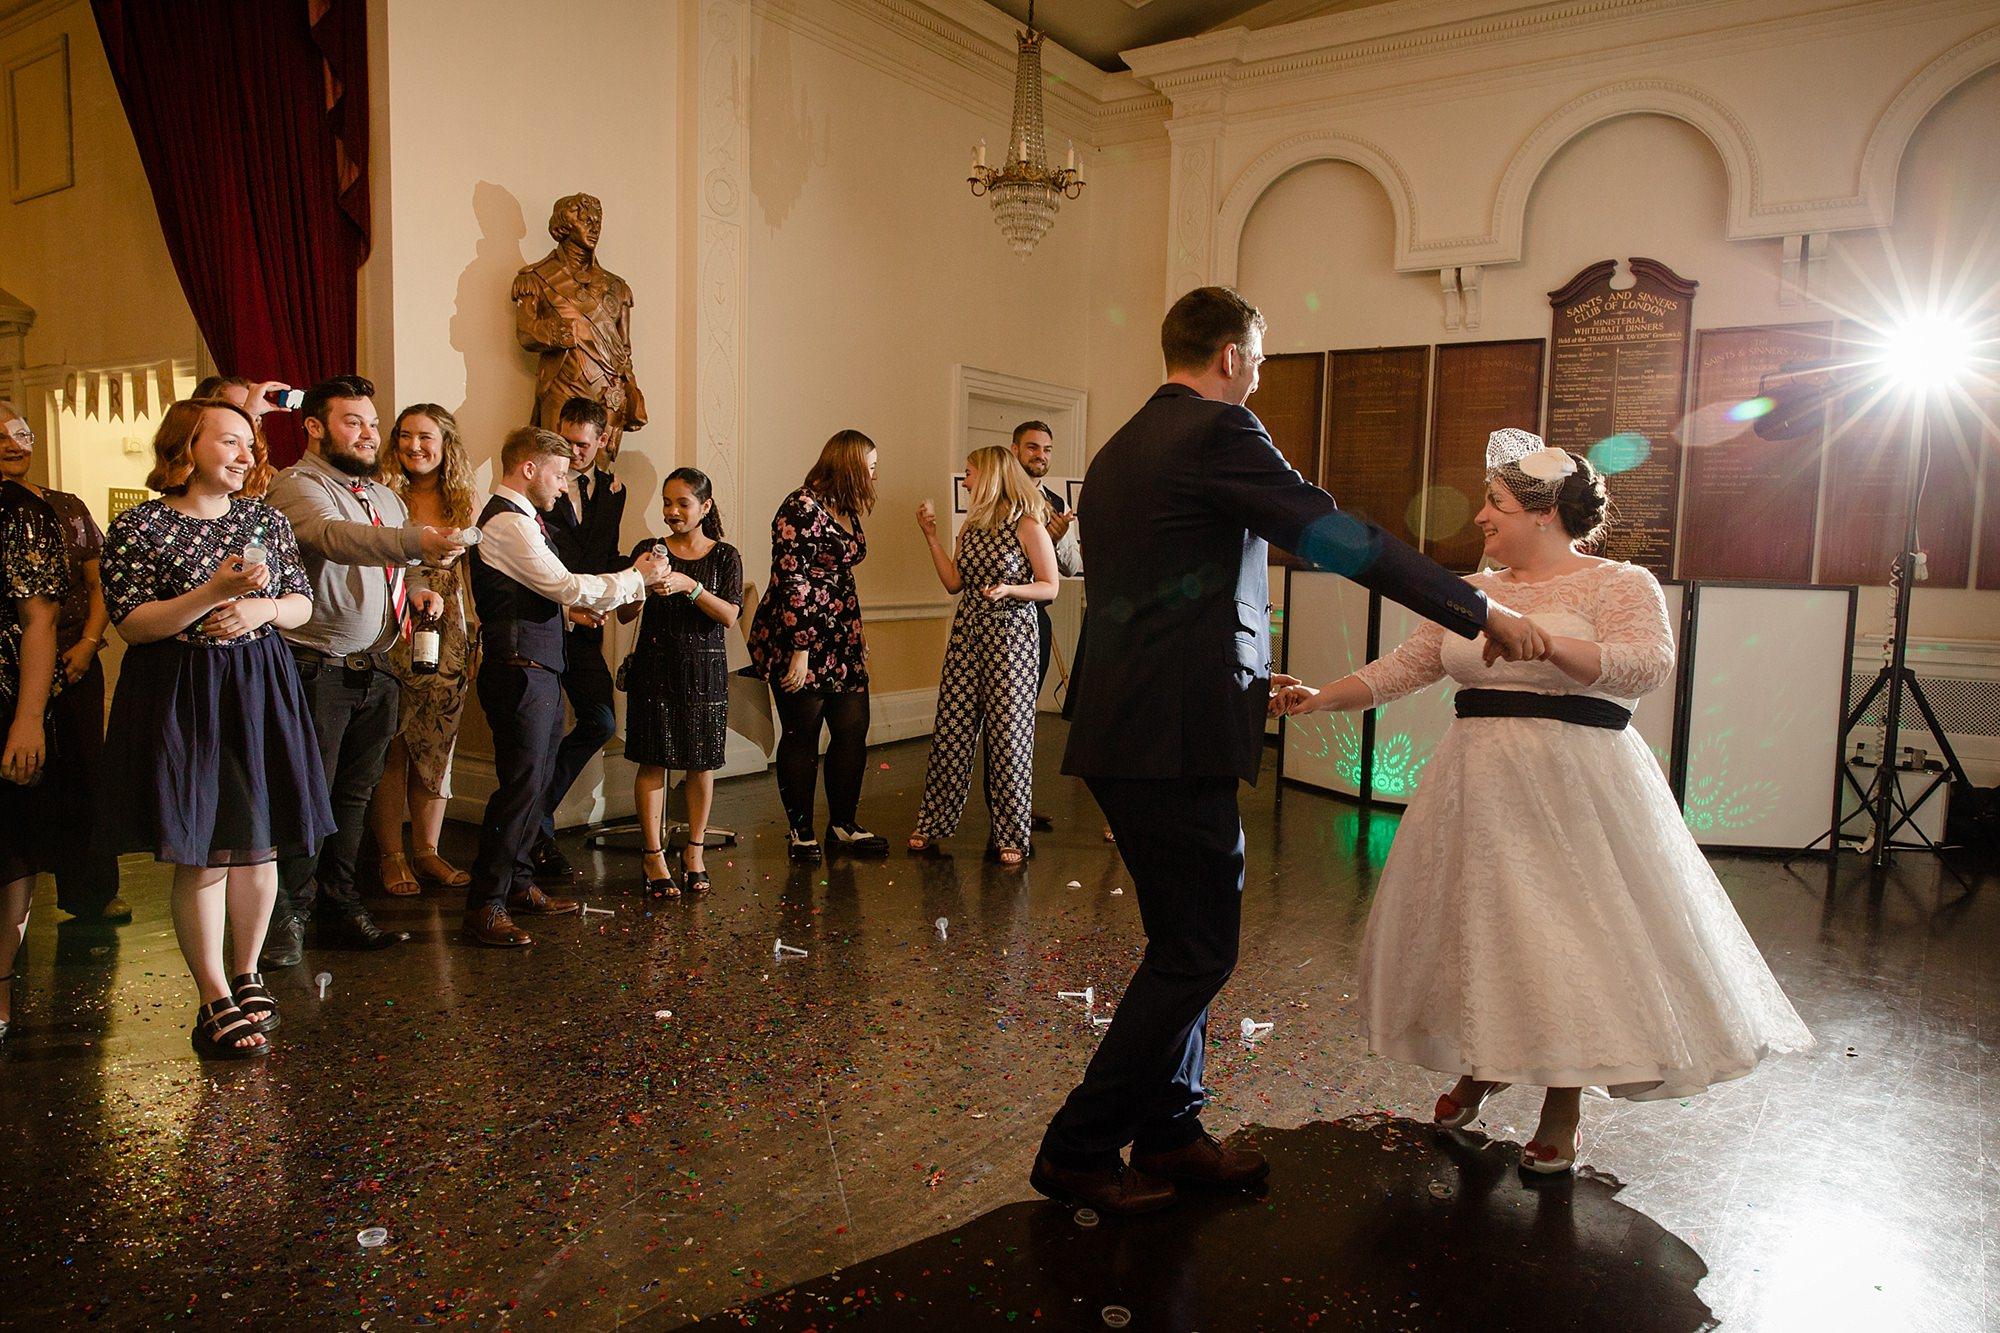 Trafalgar Tavern wedding guests shoot confetti canons during first dance